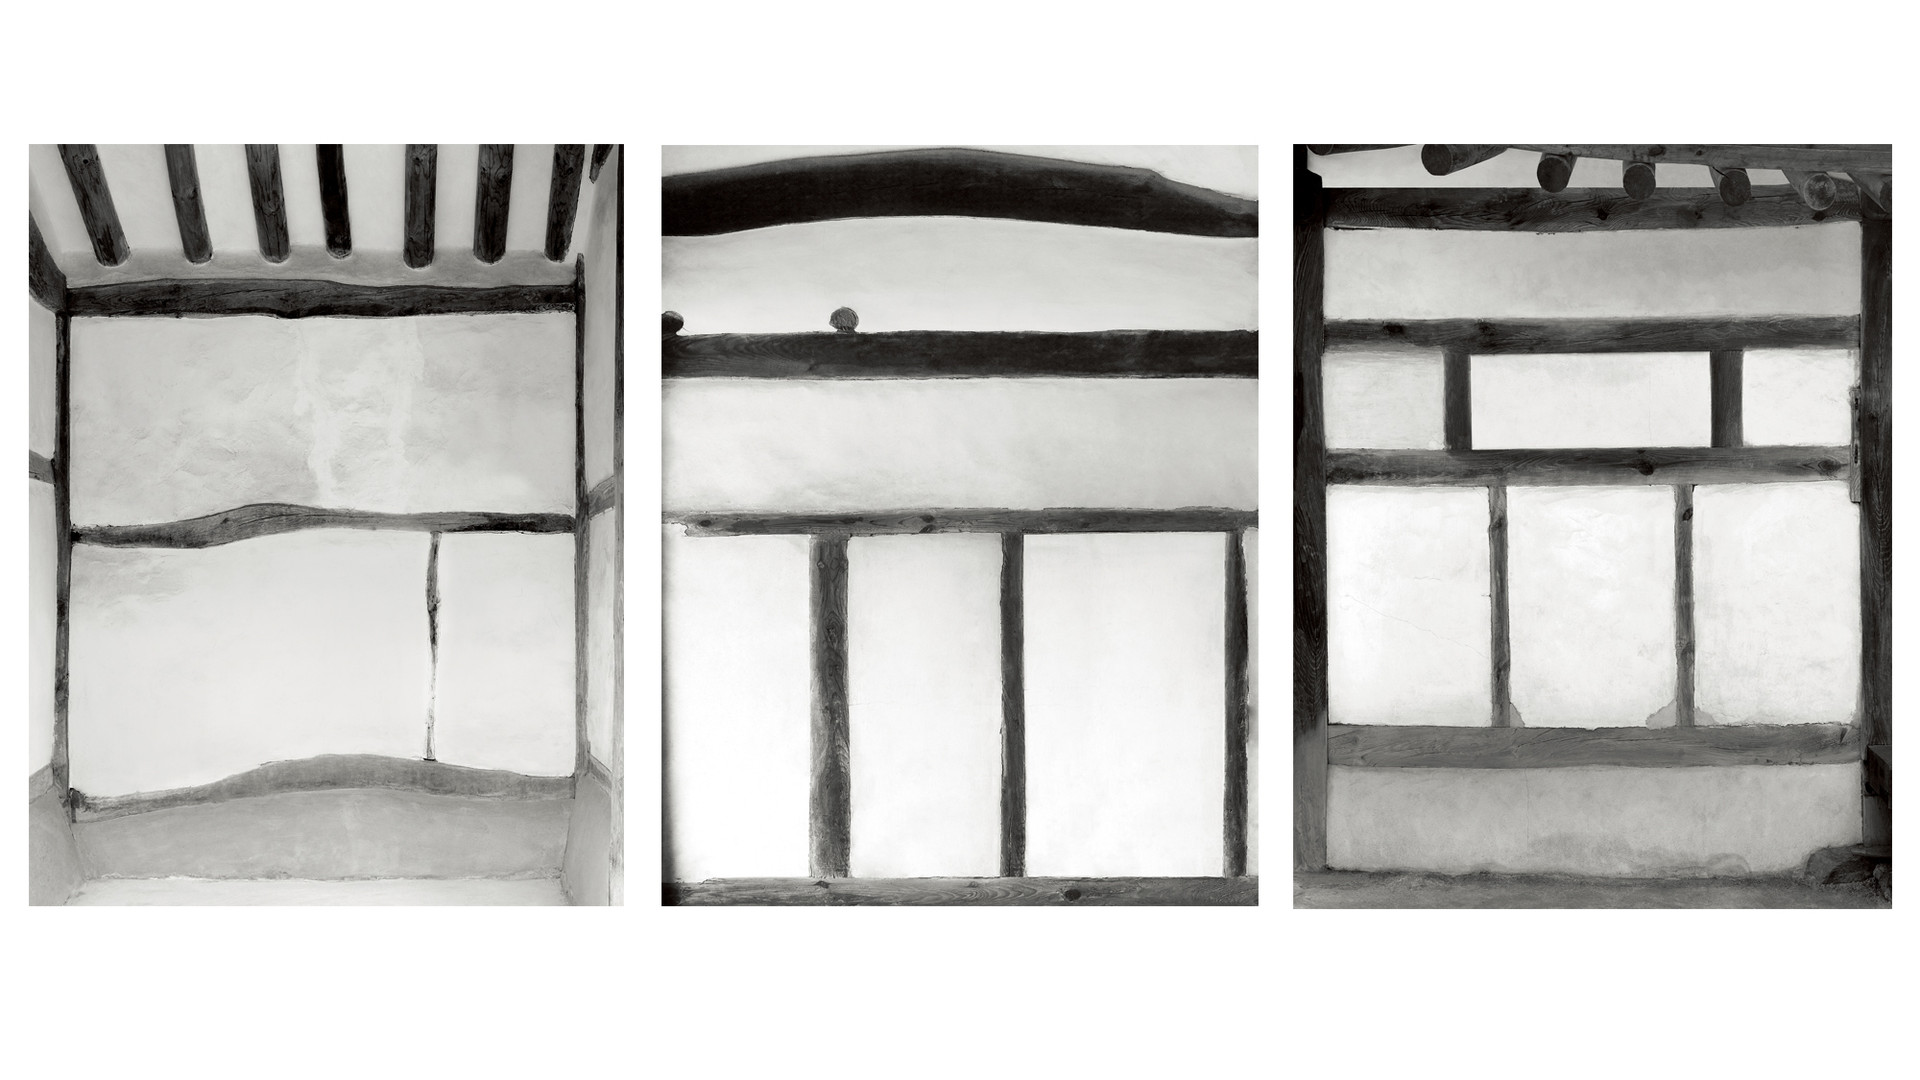 Hanok 8263, 7923, 9233, 2016, 79 x 63 cm, archival pigment print, ed. of 15